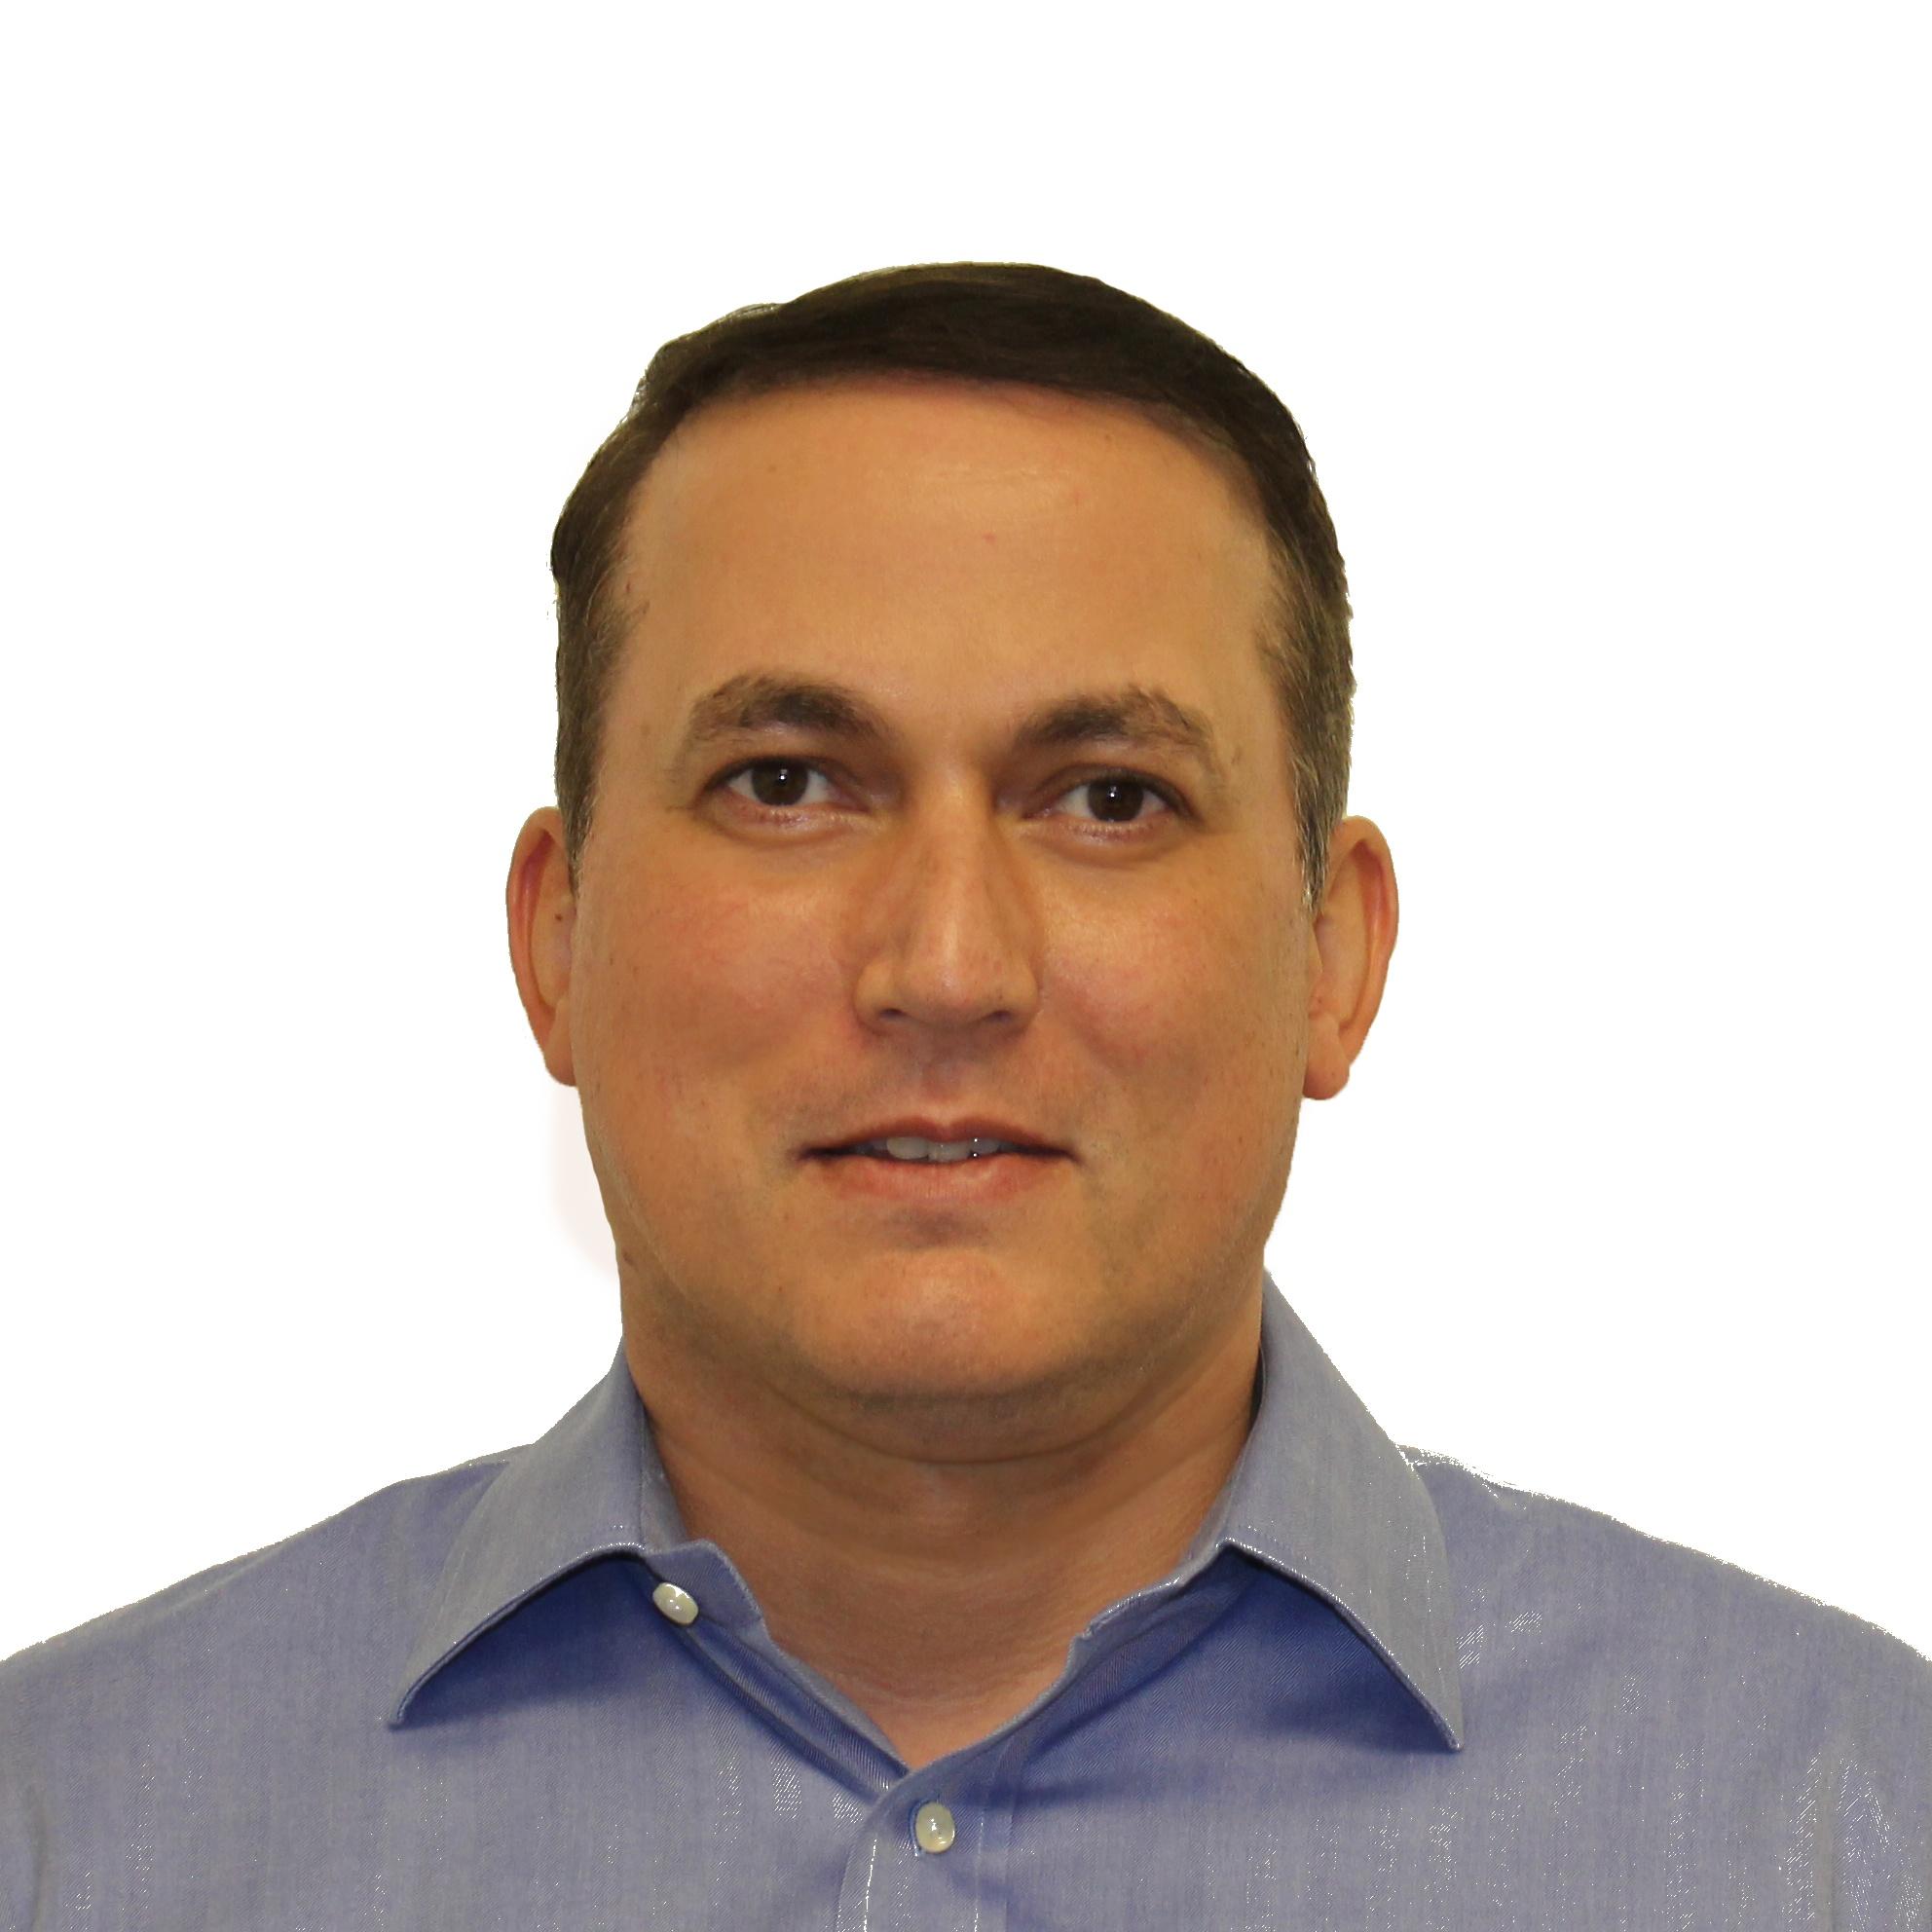 Brian Thomas, Senior Project Manager